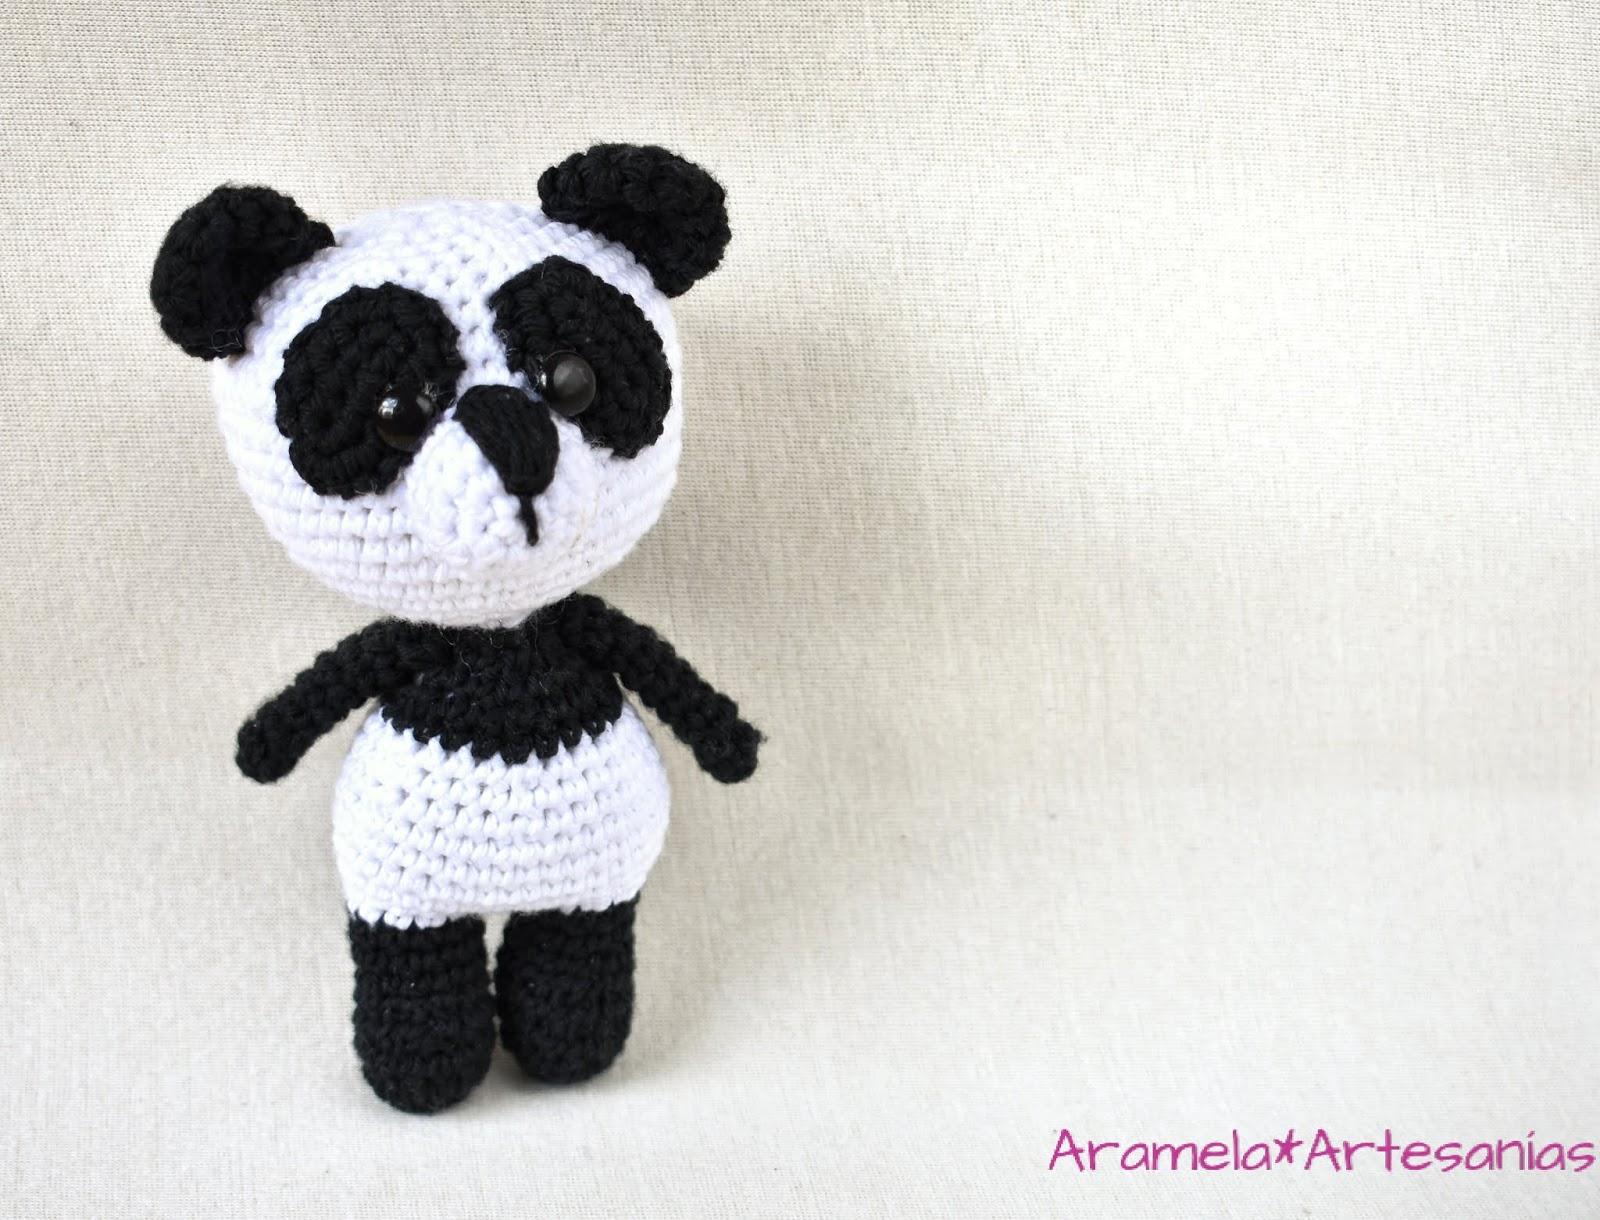 Sweet panda amigurumi pattern | Amiguroom Toys | 1220x1600